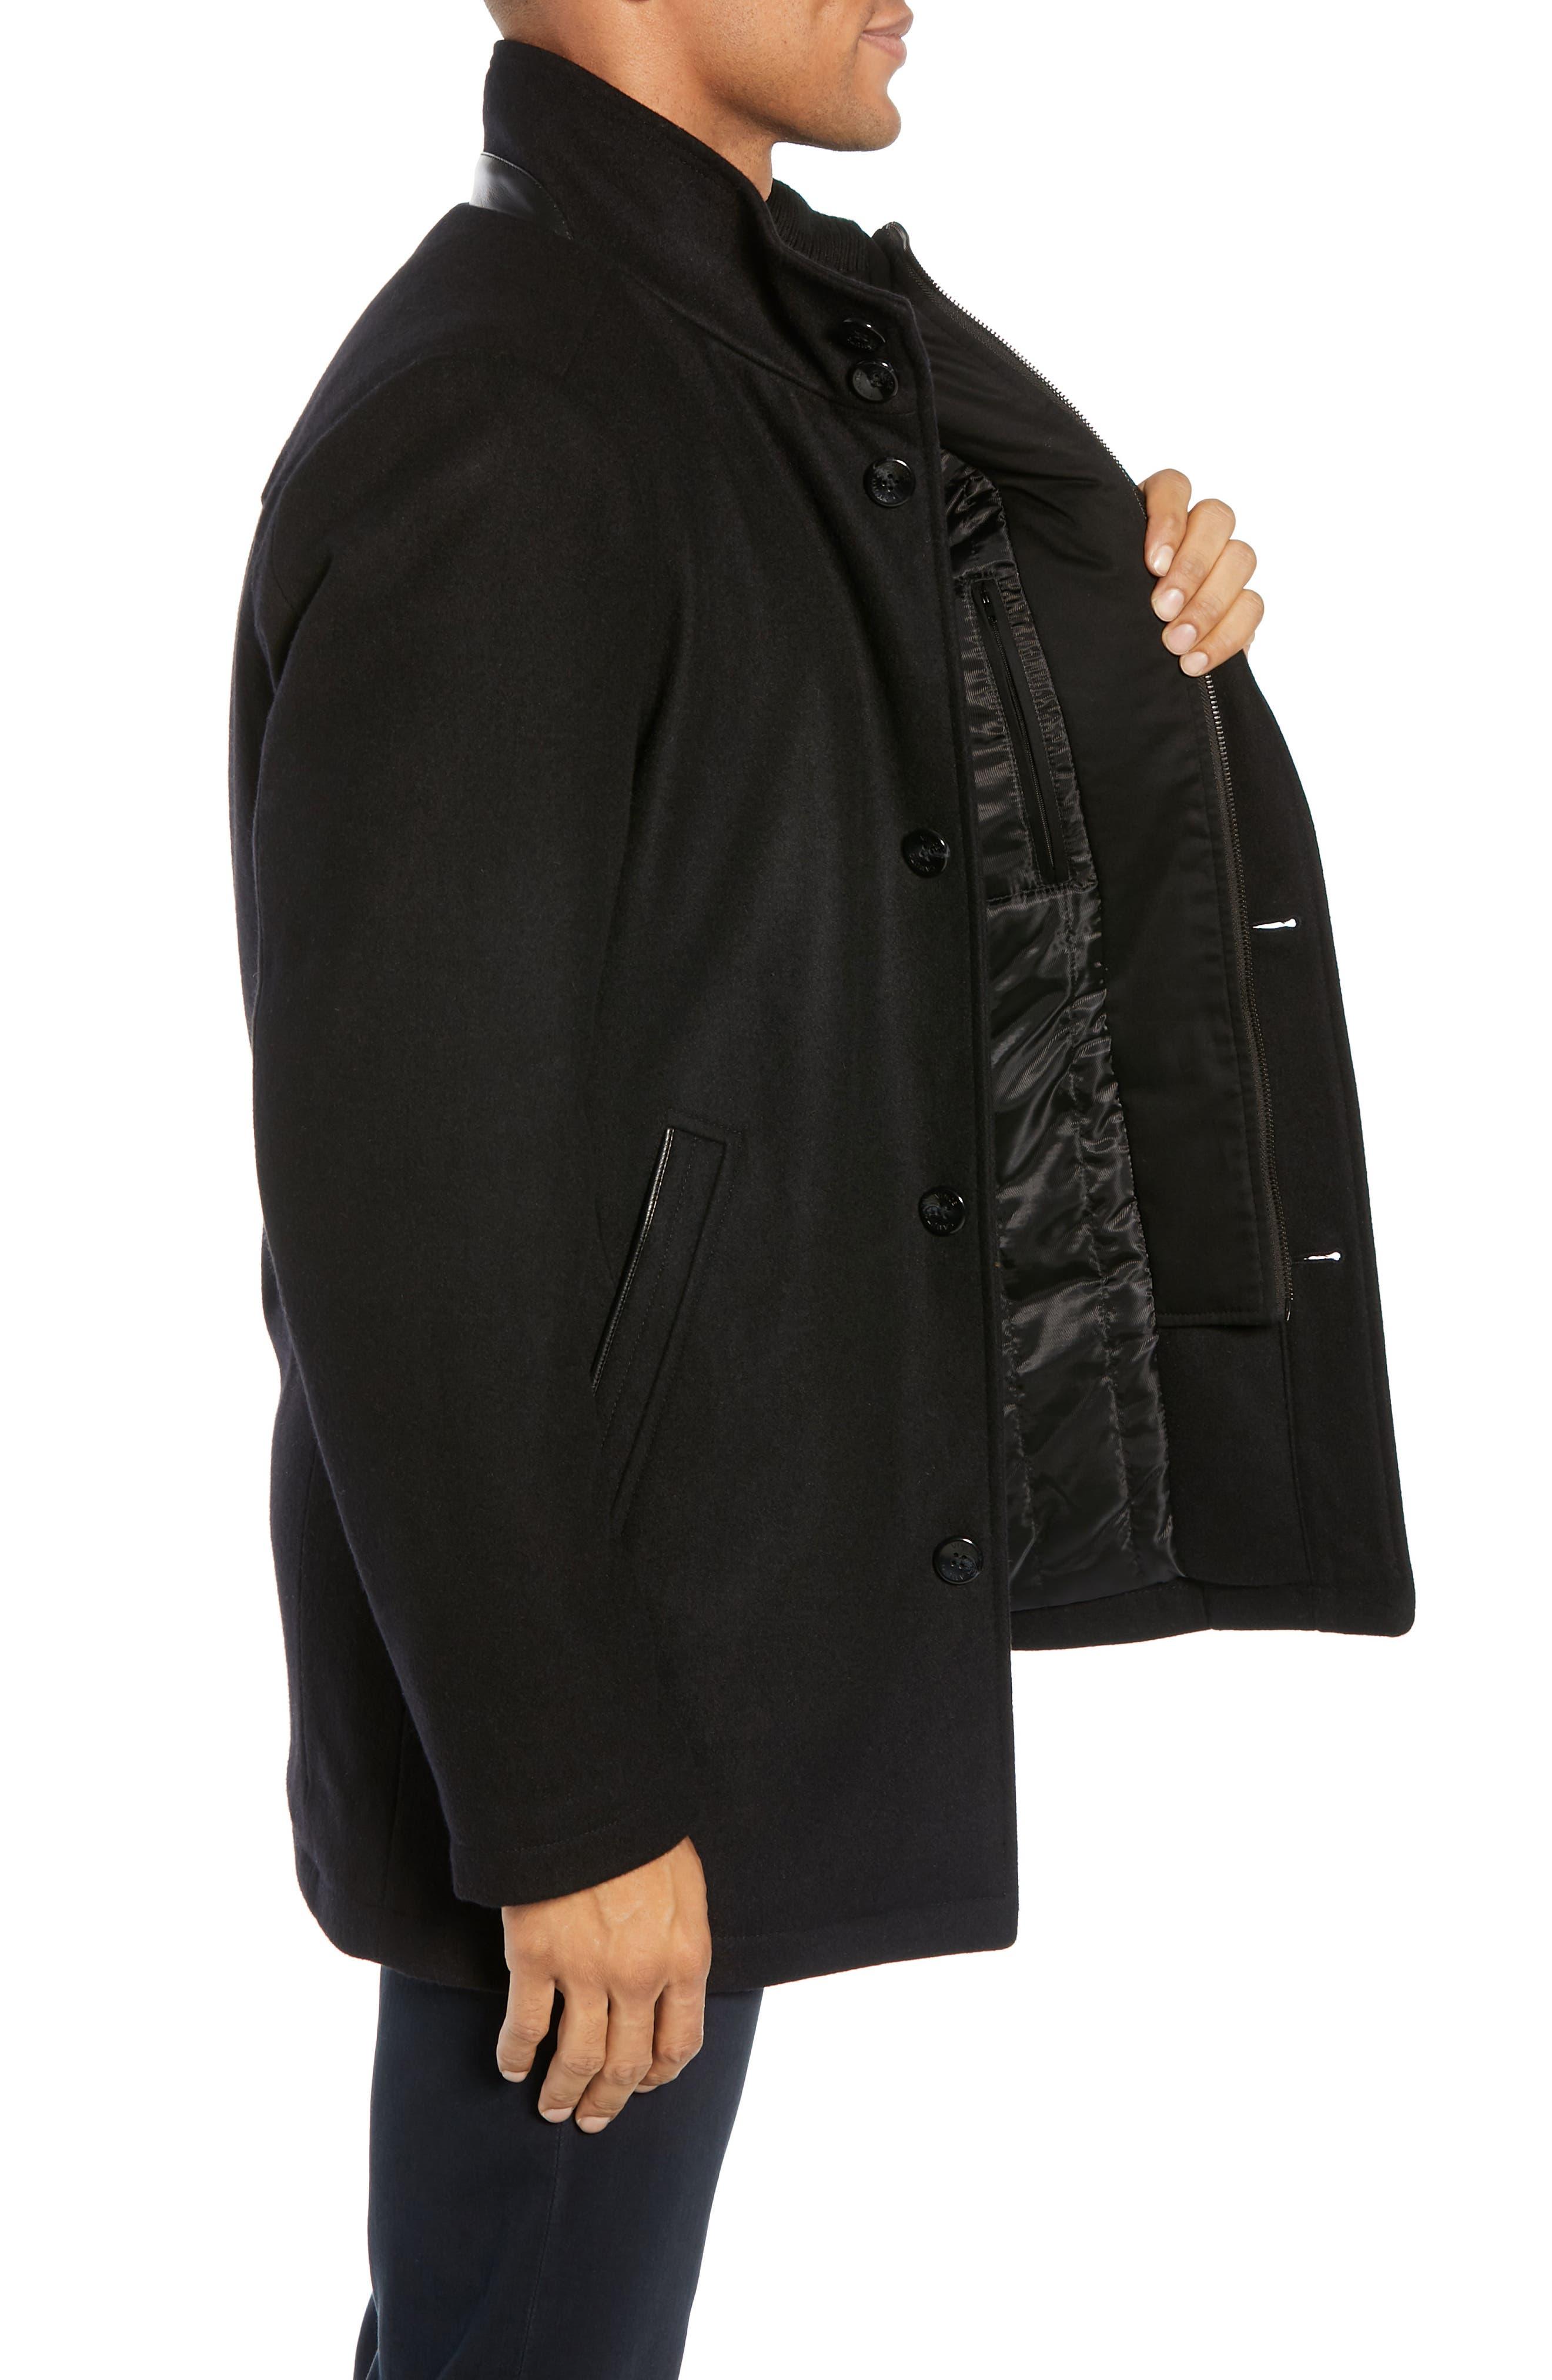 Classic Wool Blend Car Coat with Inset Bib,                             Alternate thumbnail 3, color,                             BLACK